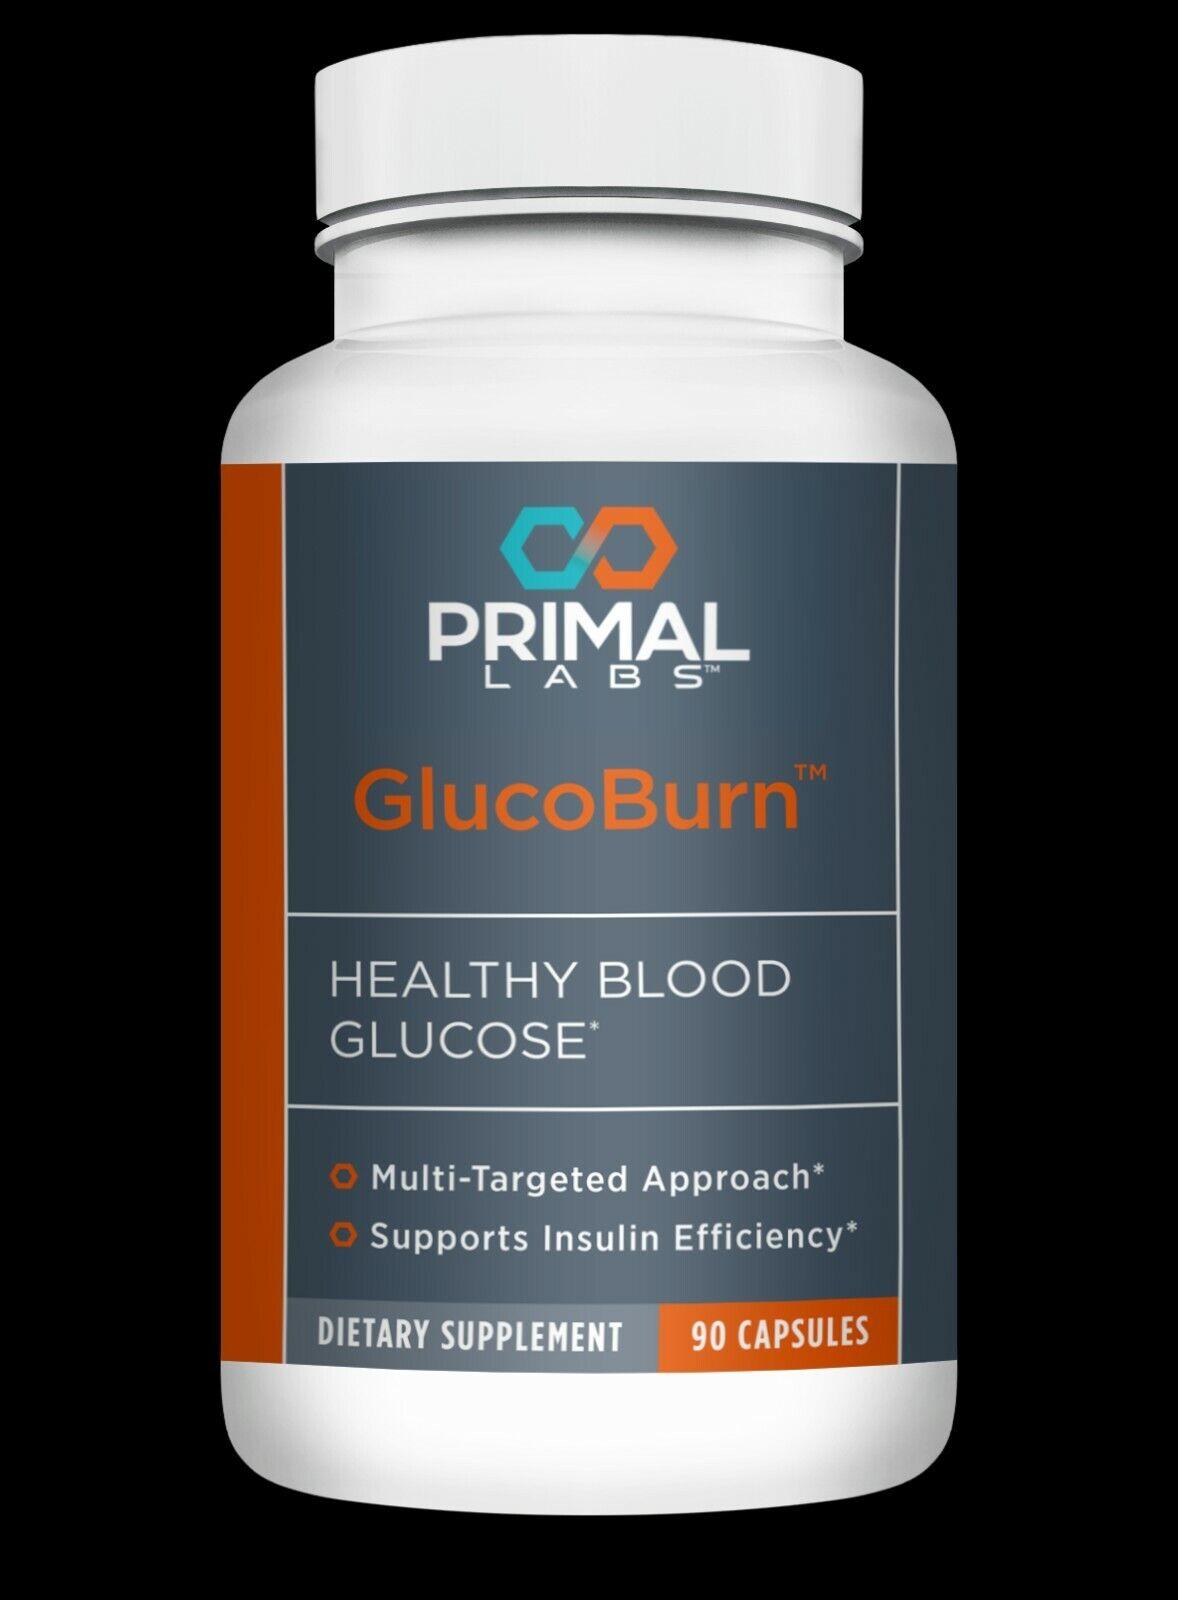 Primal Labs Gluco Burn Healthy Blood Glucose 90 Cap